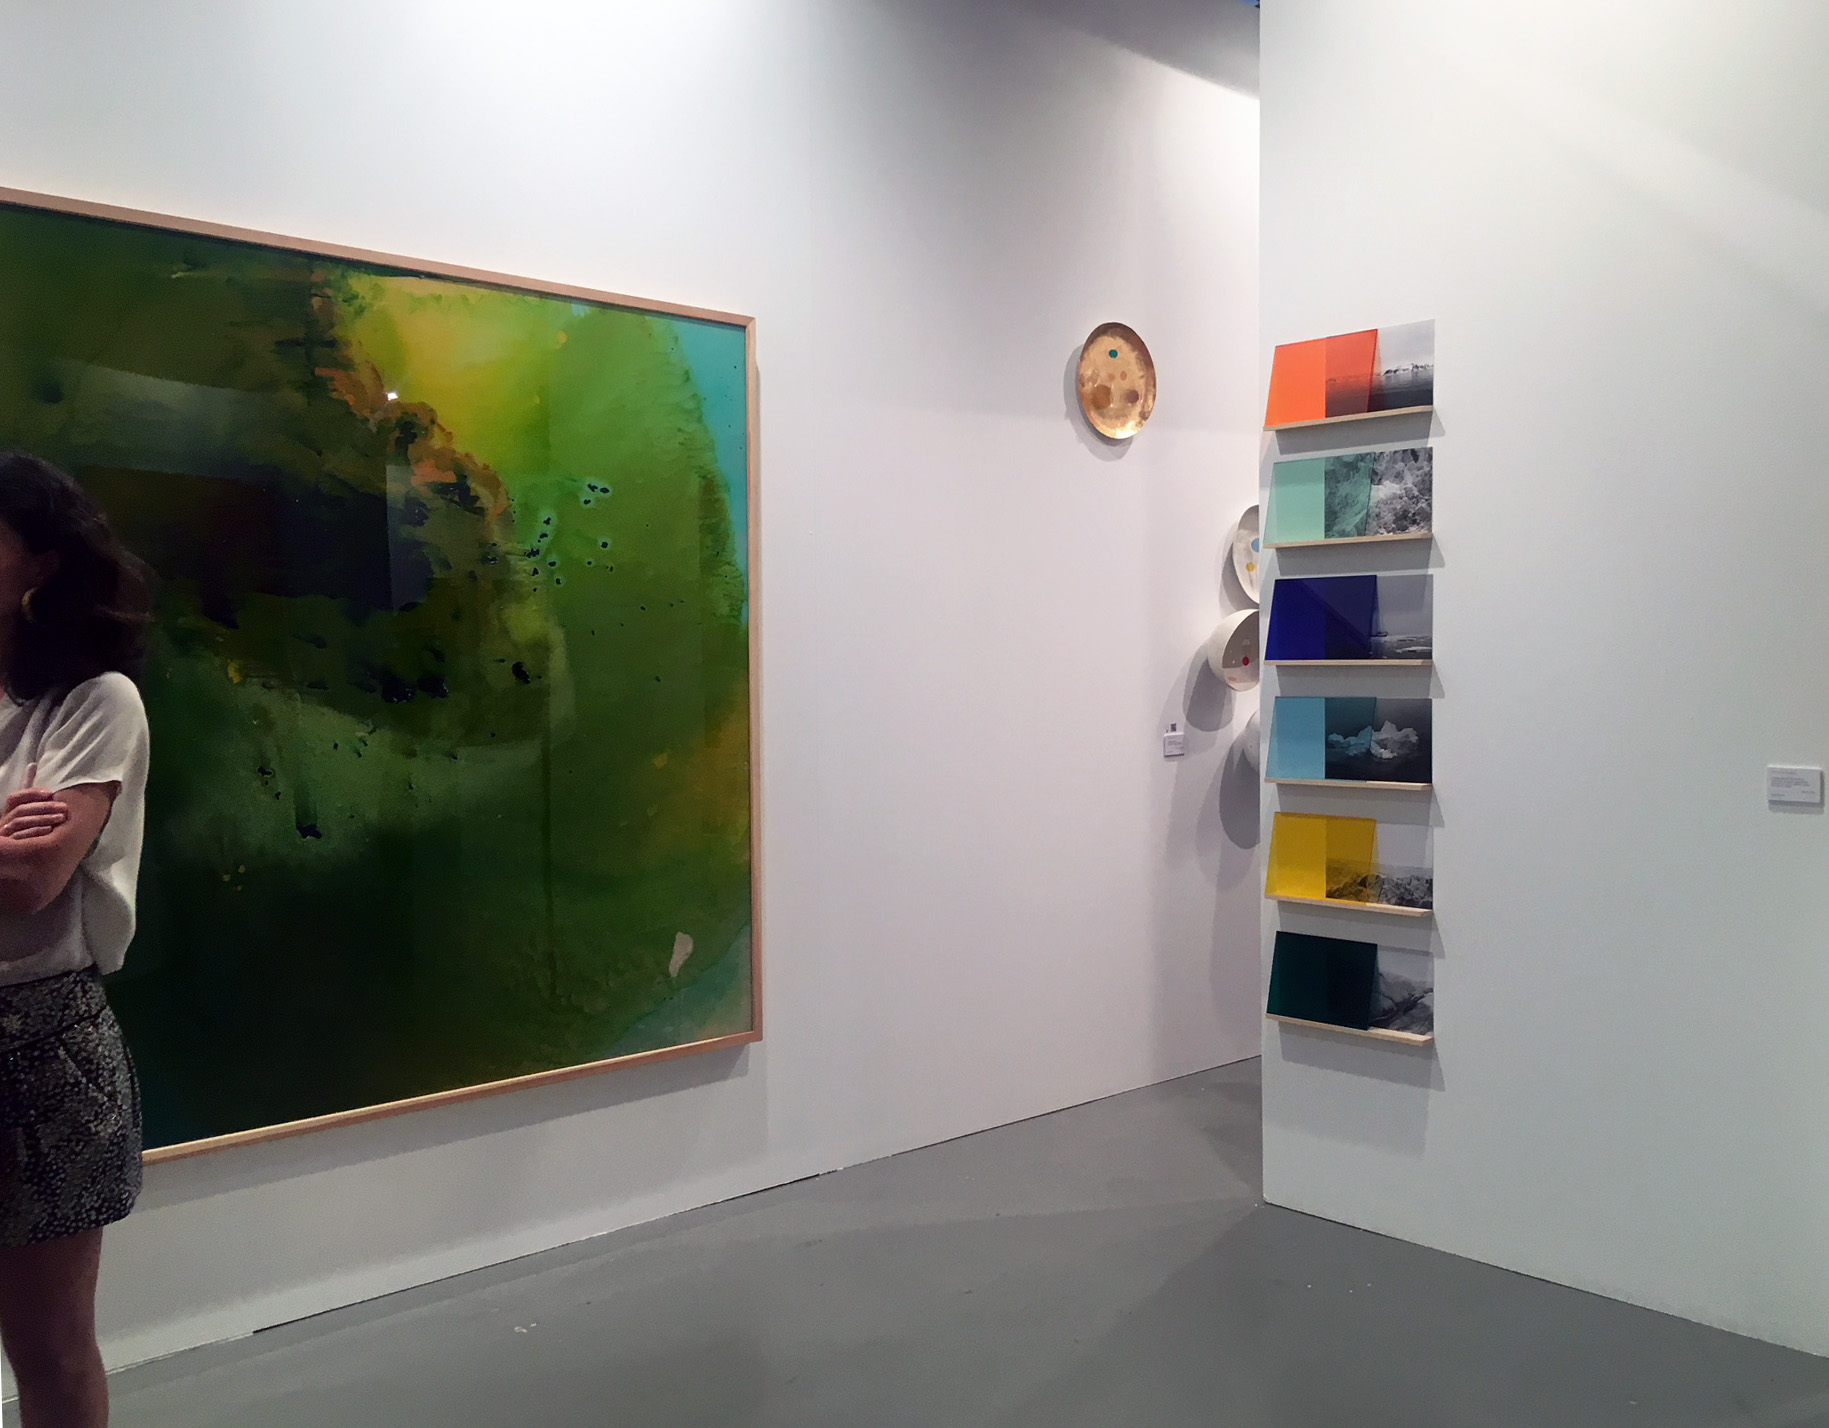 art-marbella-2017-eldevenir-3.jpg